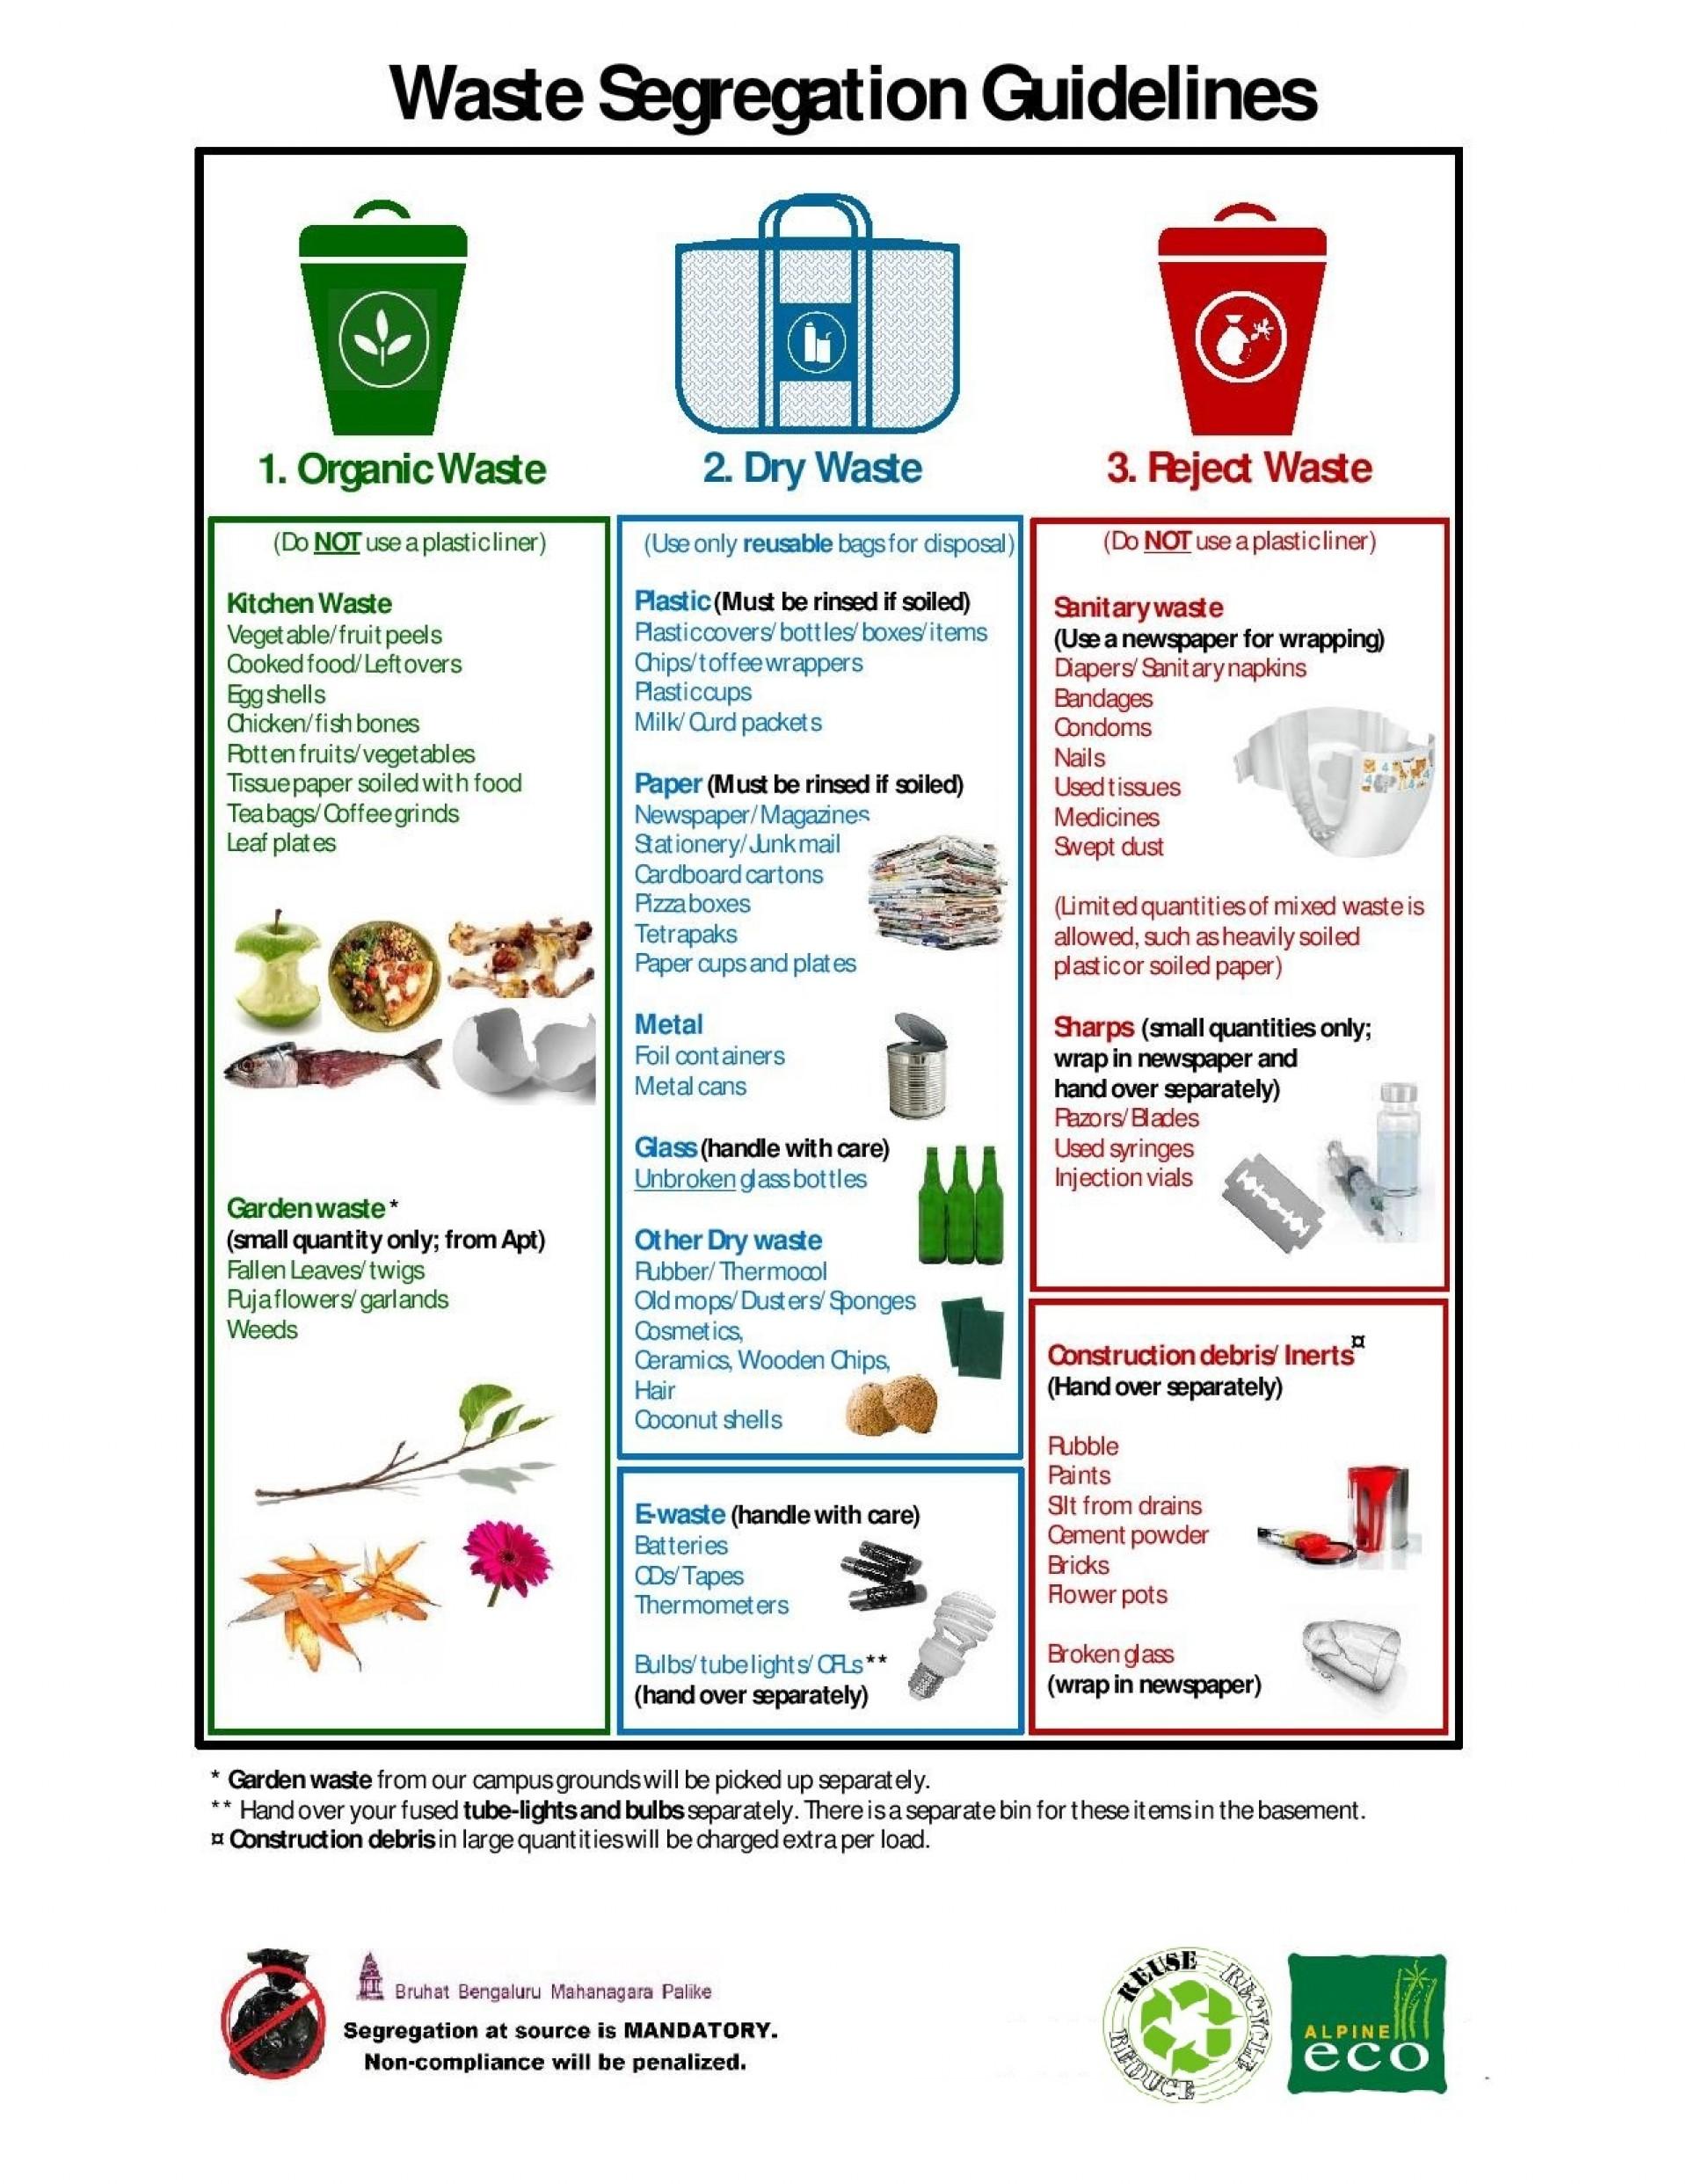 004 Essay Example20segregation20handout Segregating Fascinating Waste Introduction In School 1920